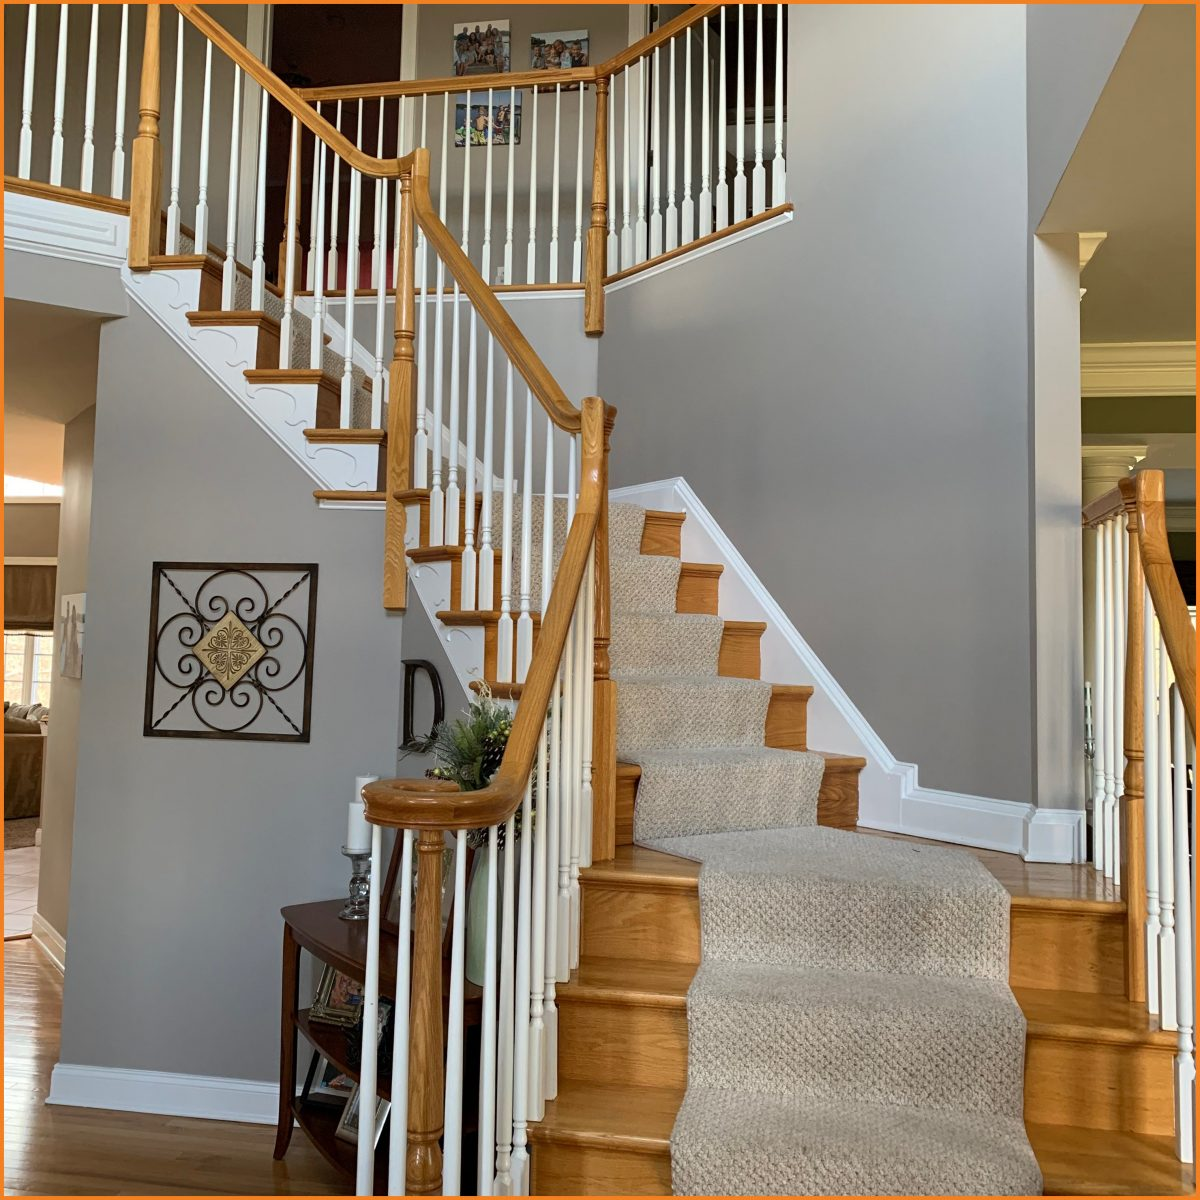 staircase before refinishing - Alexandria, NJ